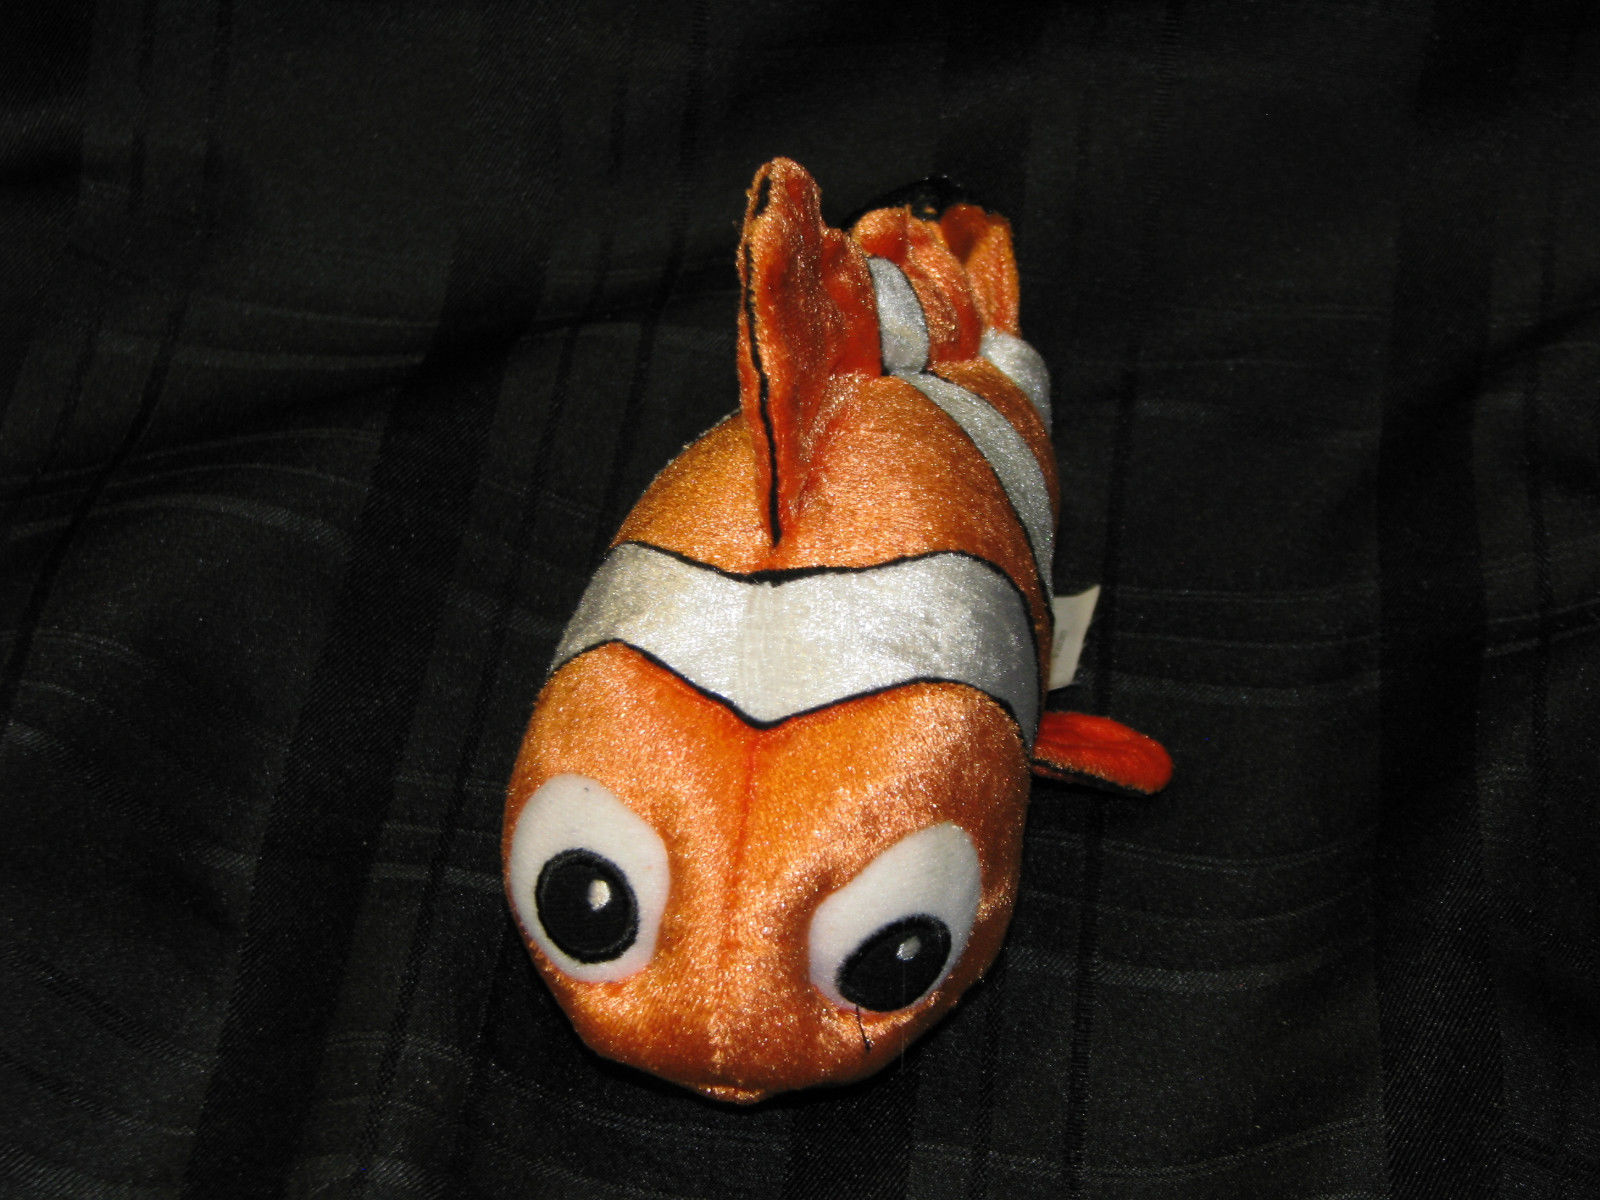 DISNEY FINDING DORY CORE NEMO PLUSH DOLL FIGURE ORANGE WHITE TROPICAL FISH TOY